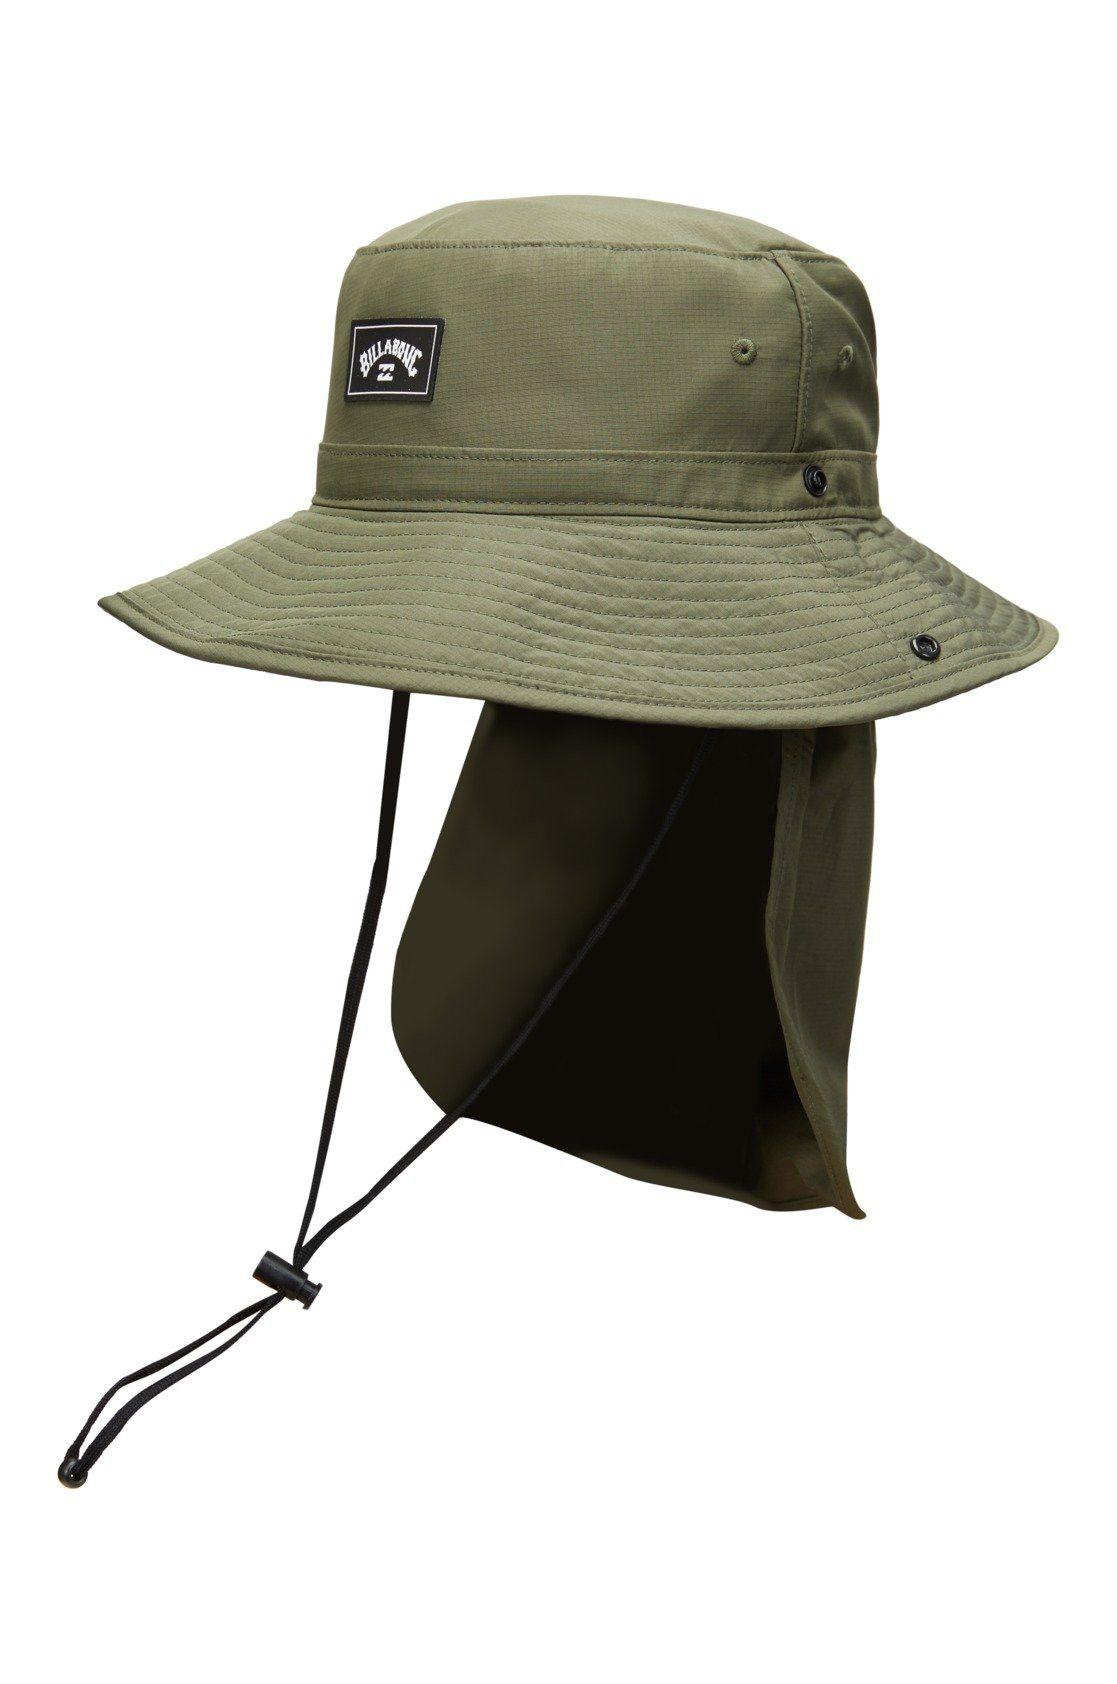 Chapeu Billabong ADIV BIG JOHN HAT ADVENTURE DIVISION Military